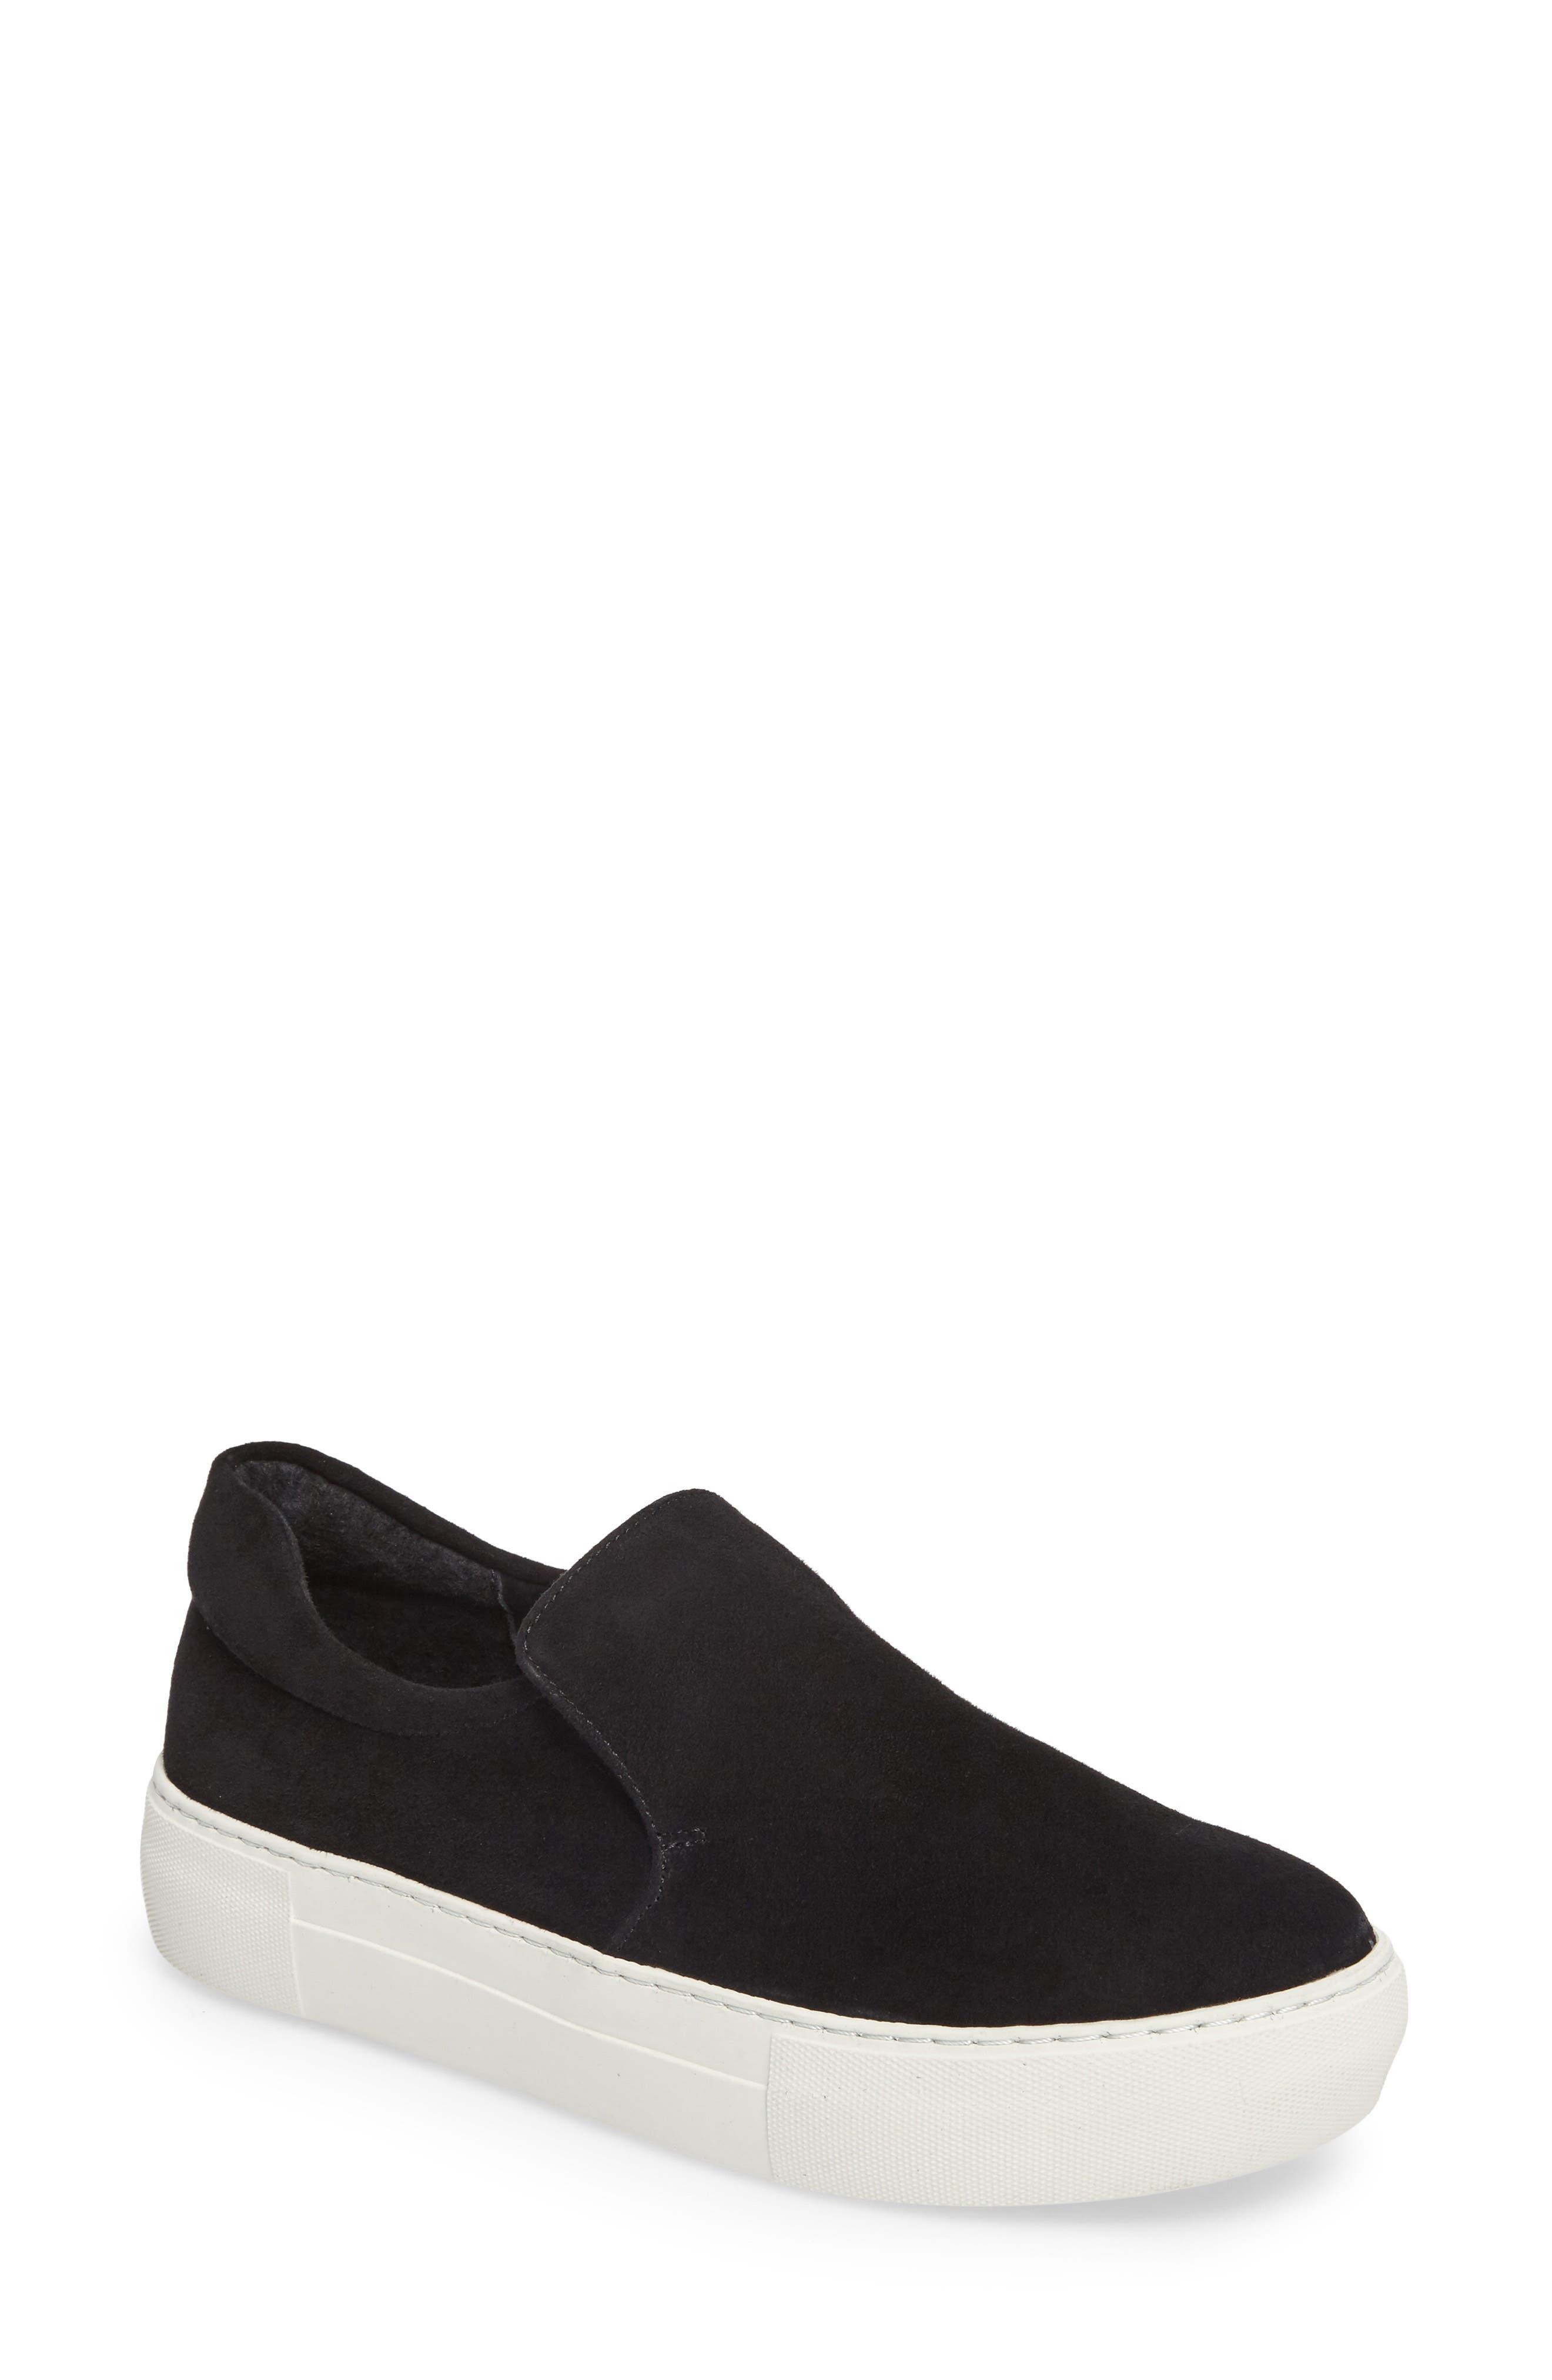 Acer Slip-On Sneaker,                             Main thumbnail 1, color,                             BLACK SUEDE